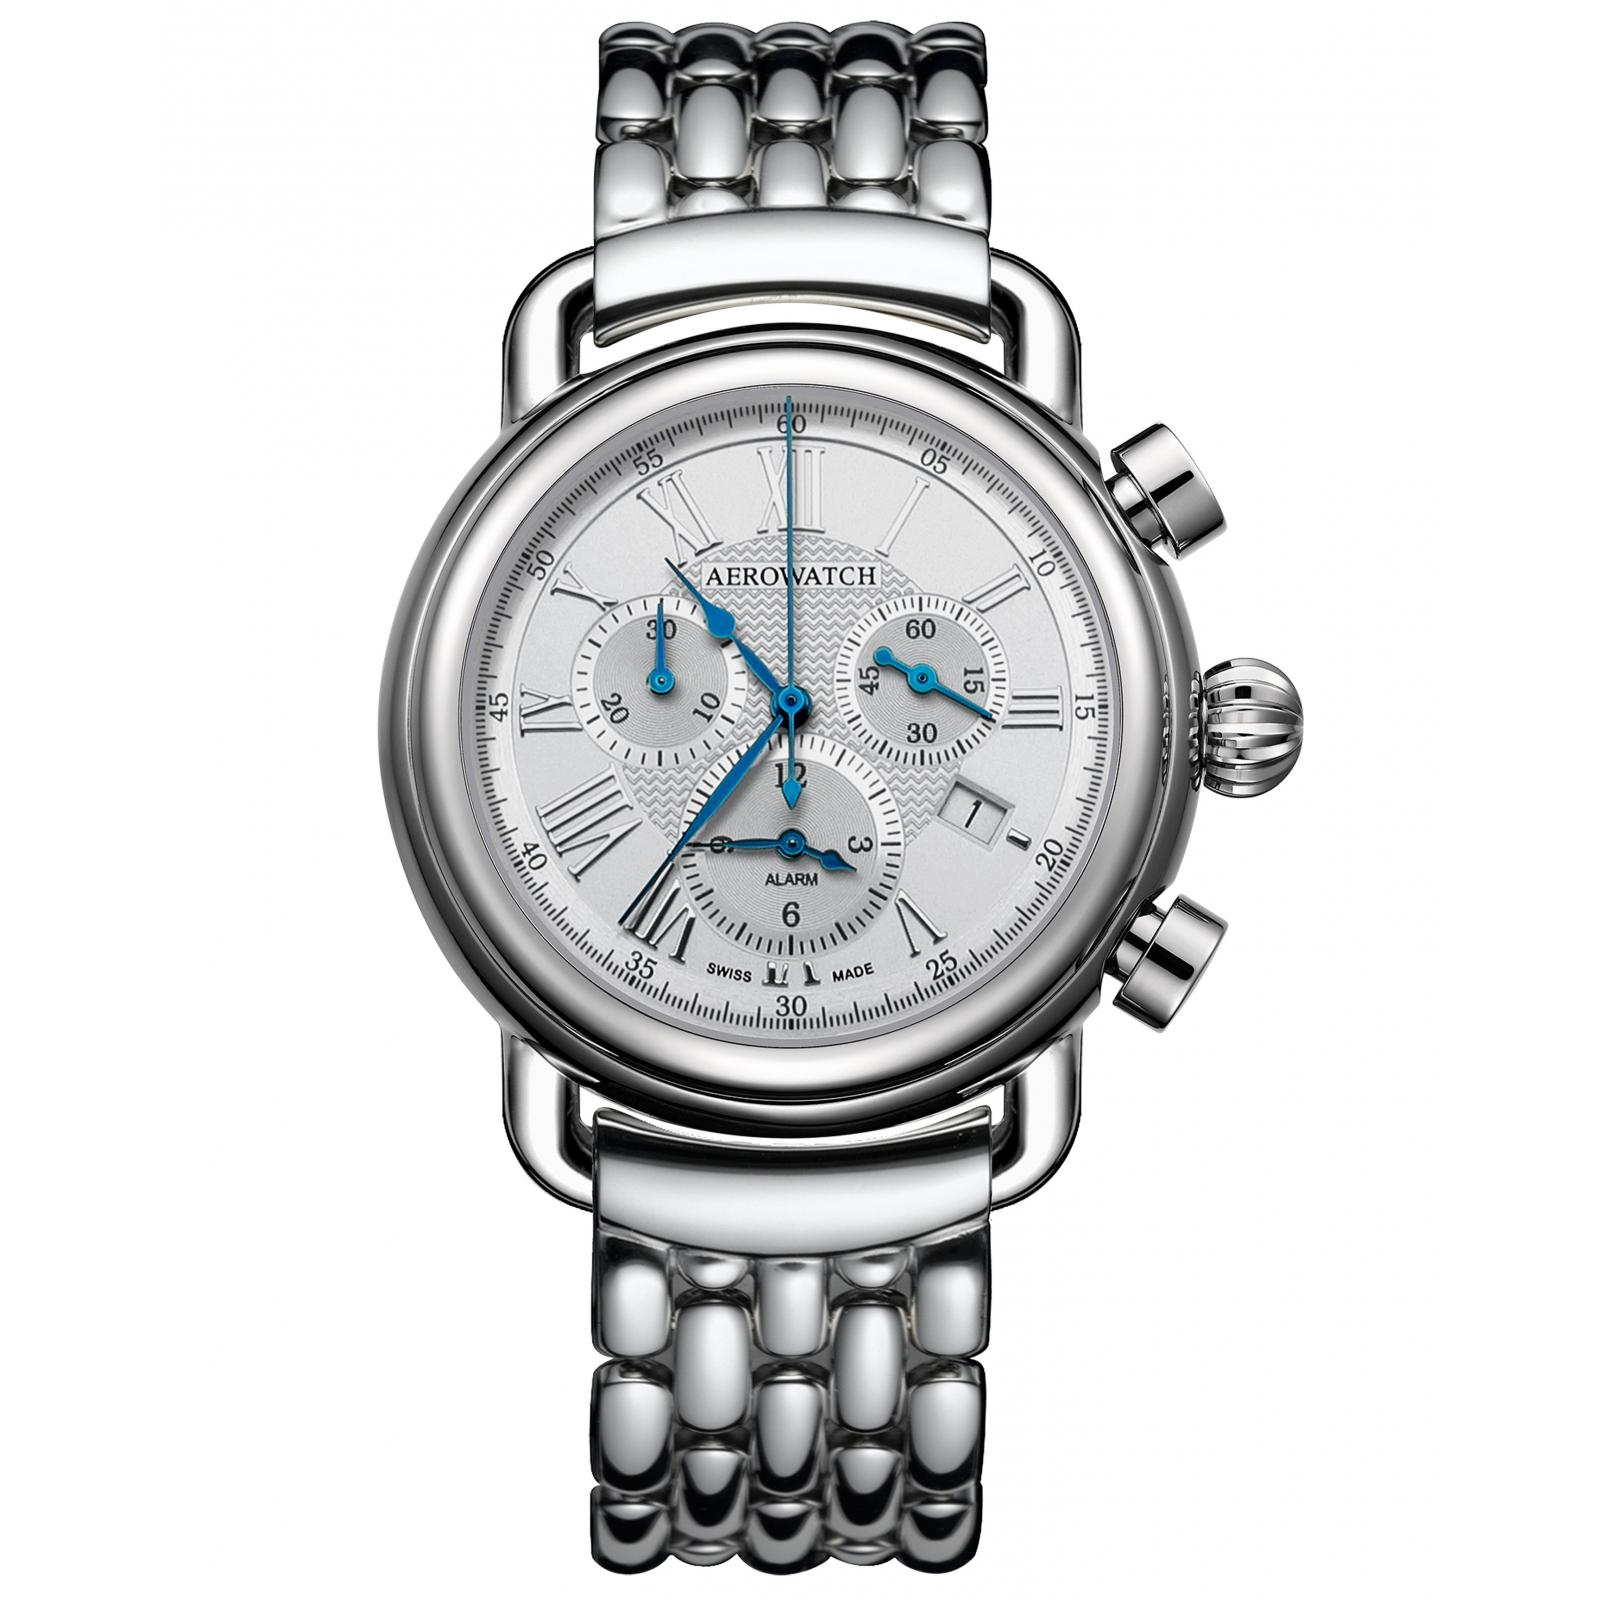 Ceas Aerowatch Alarm Clock 85939 AA09 M